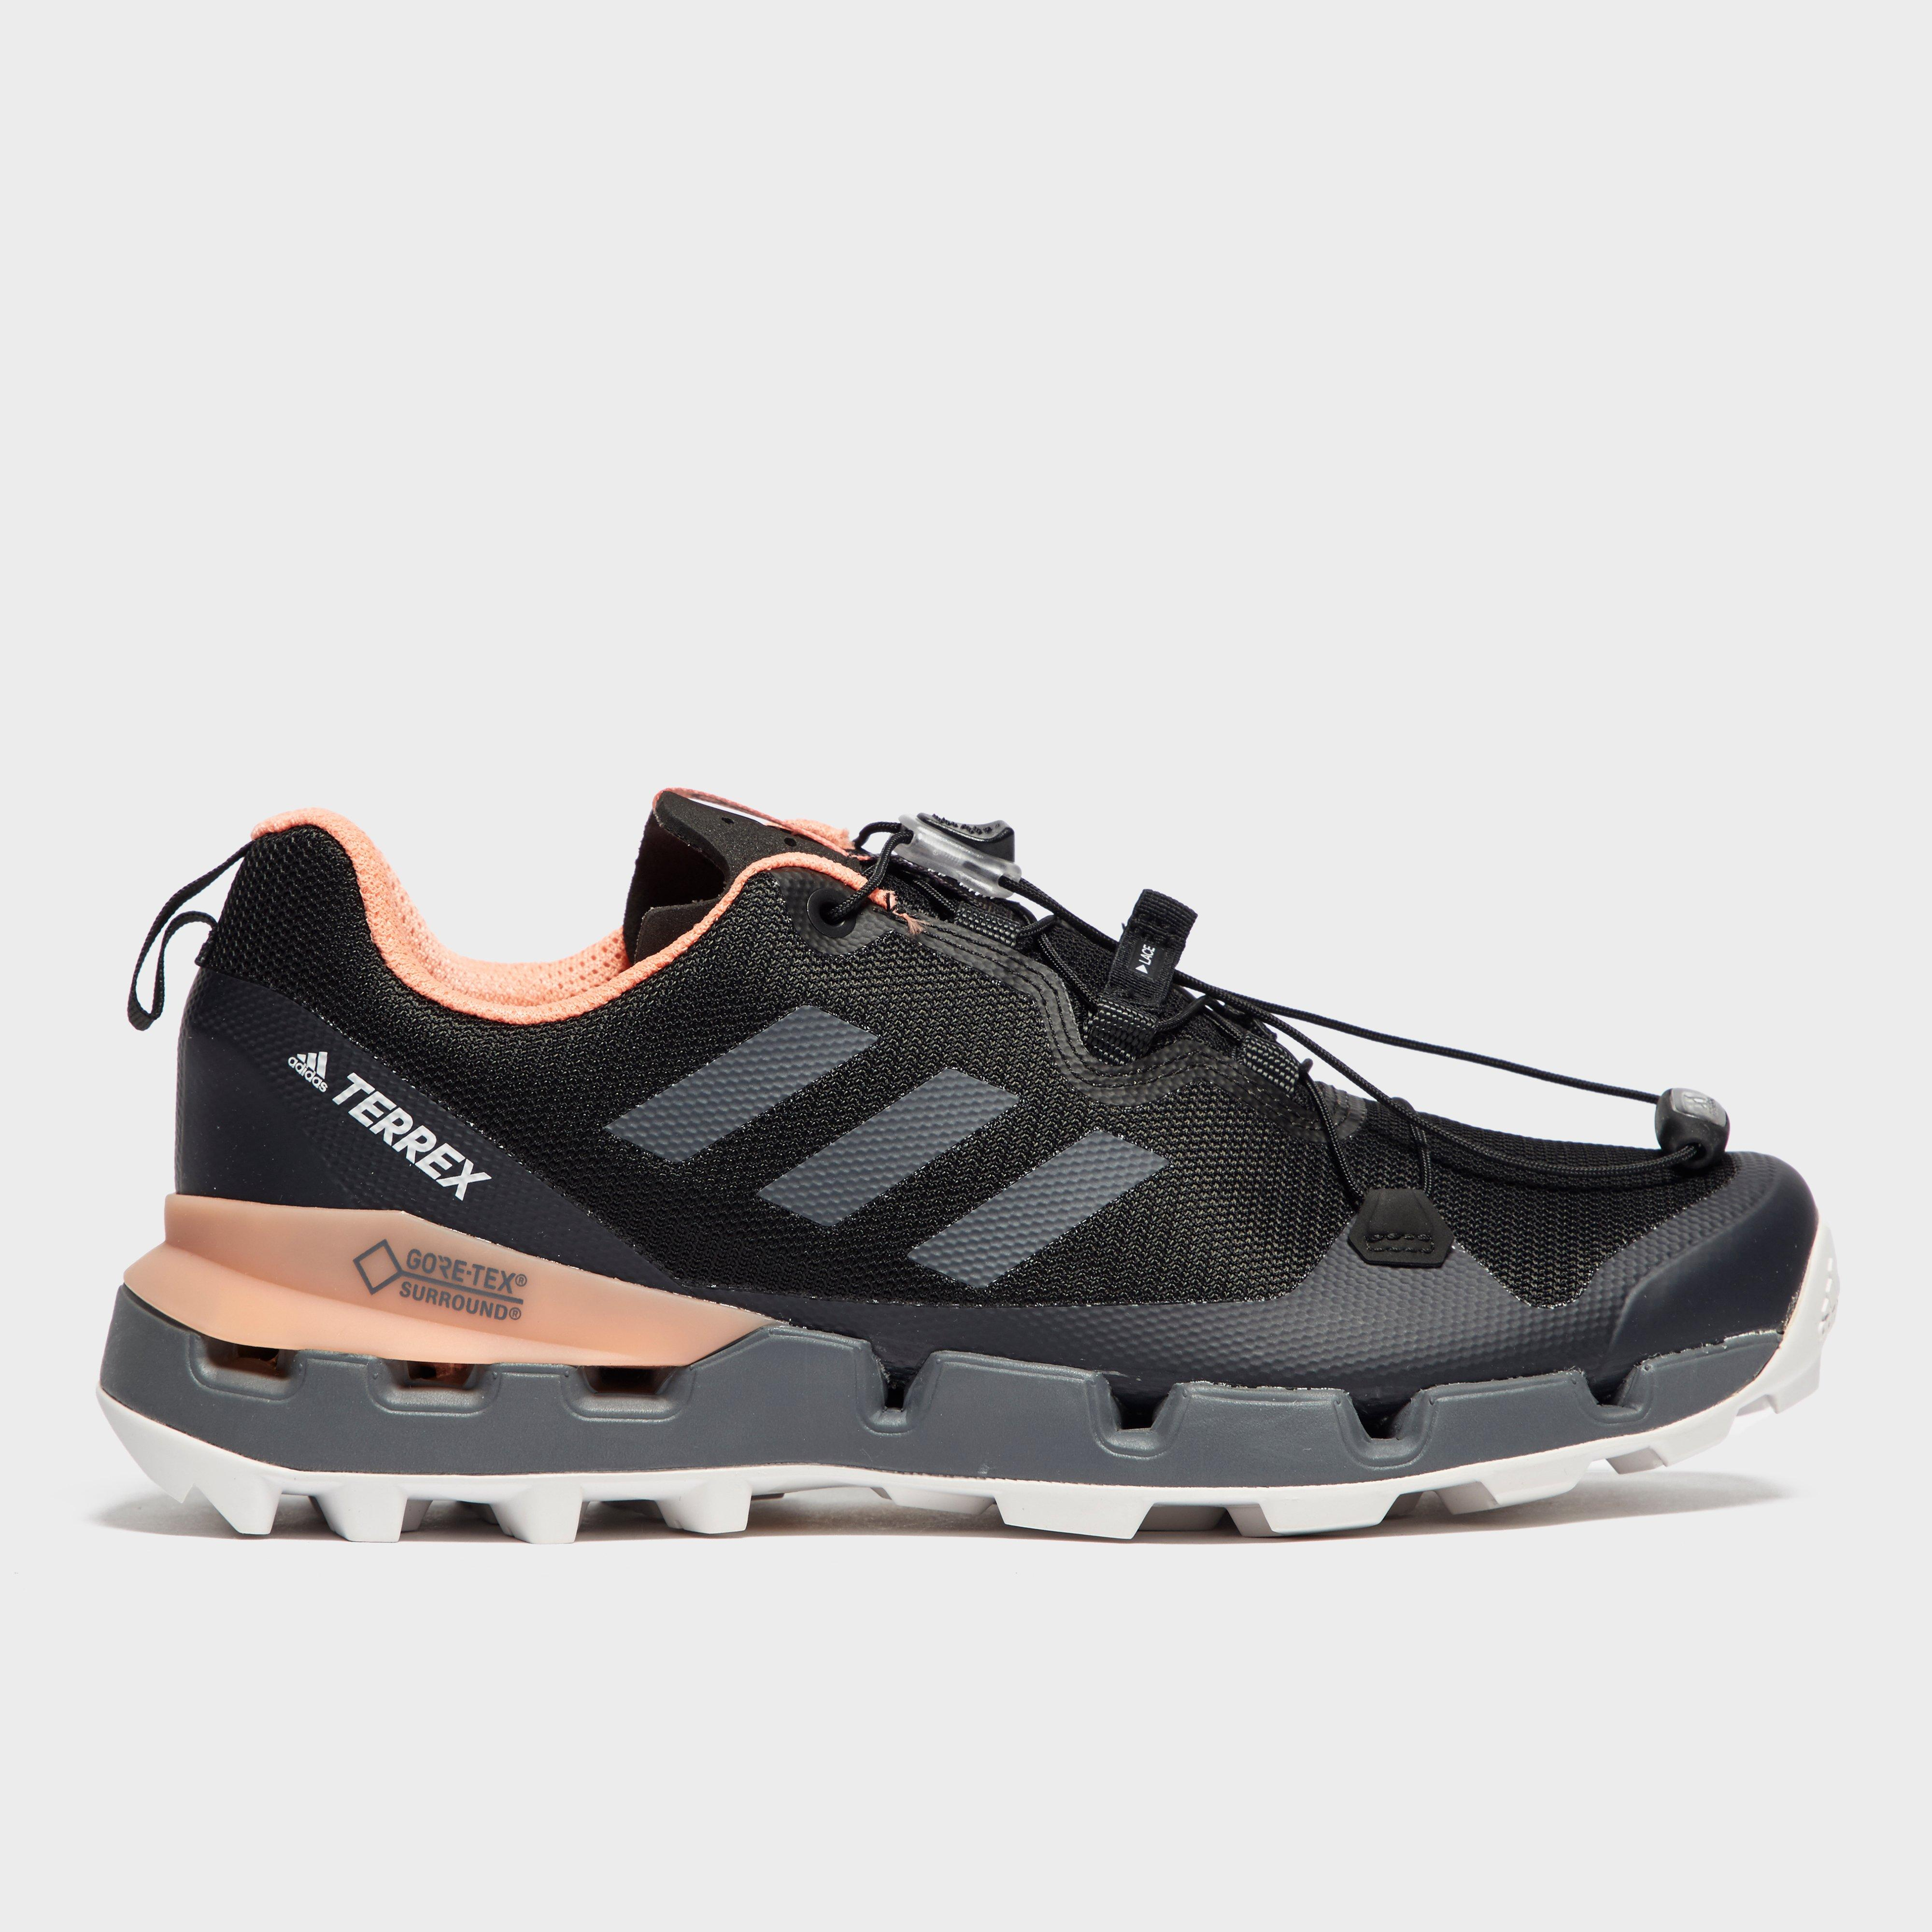 3cf9c8cf934 adidas Women s Terrex Fast GORE-TEX ® Surround Shoes